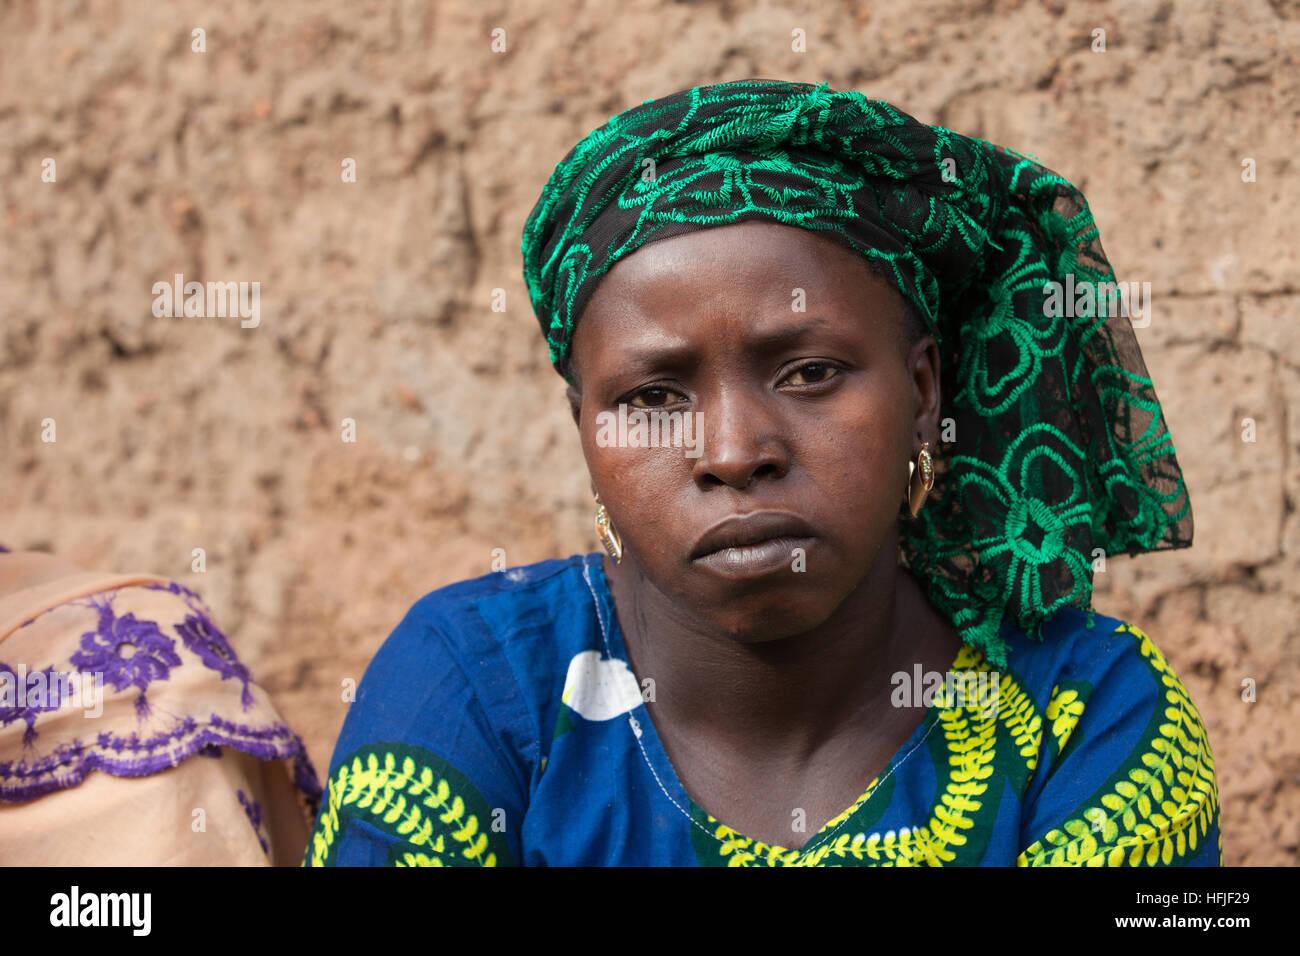 Koumban village, Guinea, 2nd May 2015; Sona Sacko, 75,  and her daughter Tenein Doumbouya, 35, are Shea butter sellers. - Stock Image